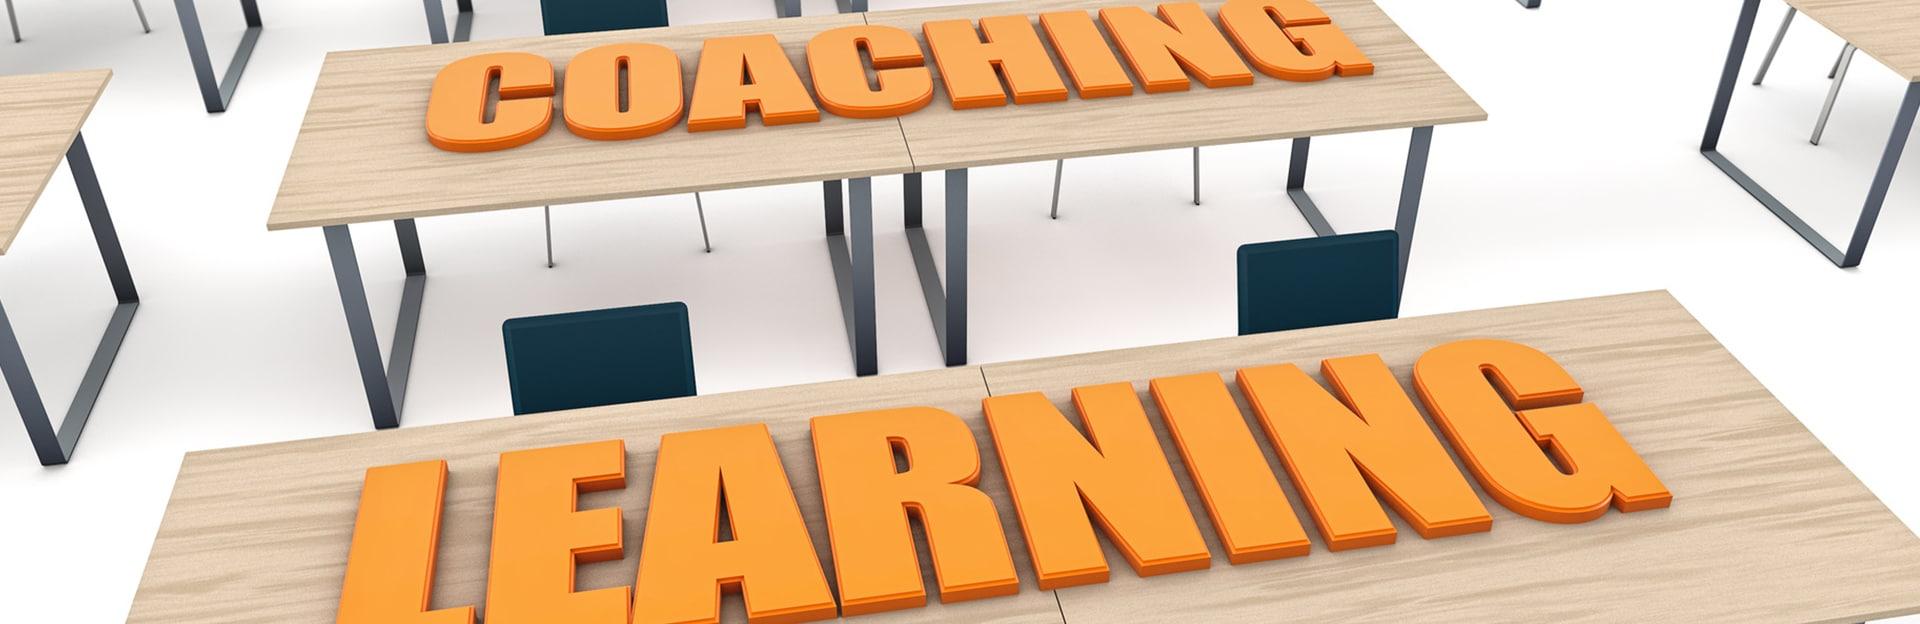 Coaching and Learning Kwelanga banner